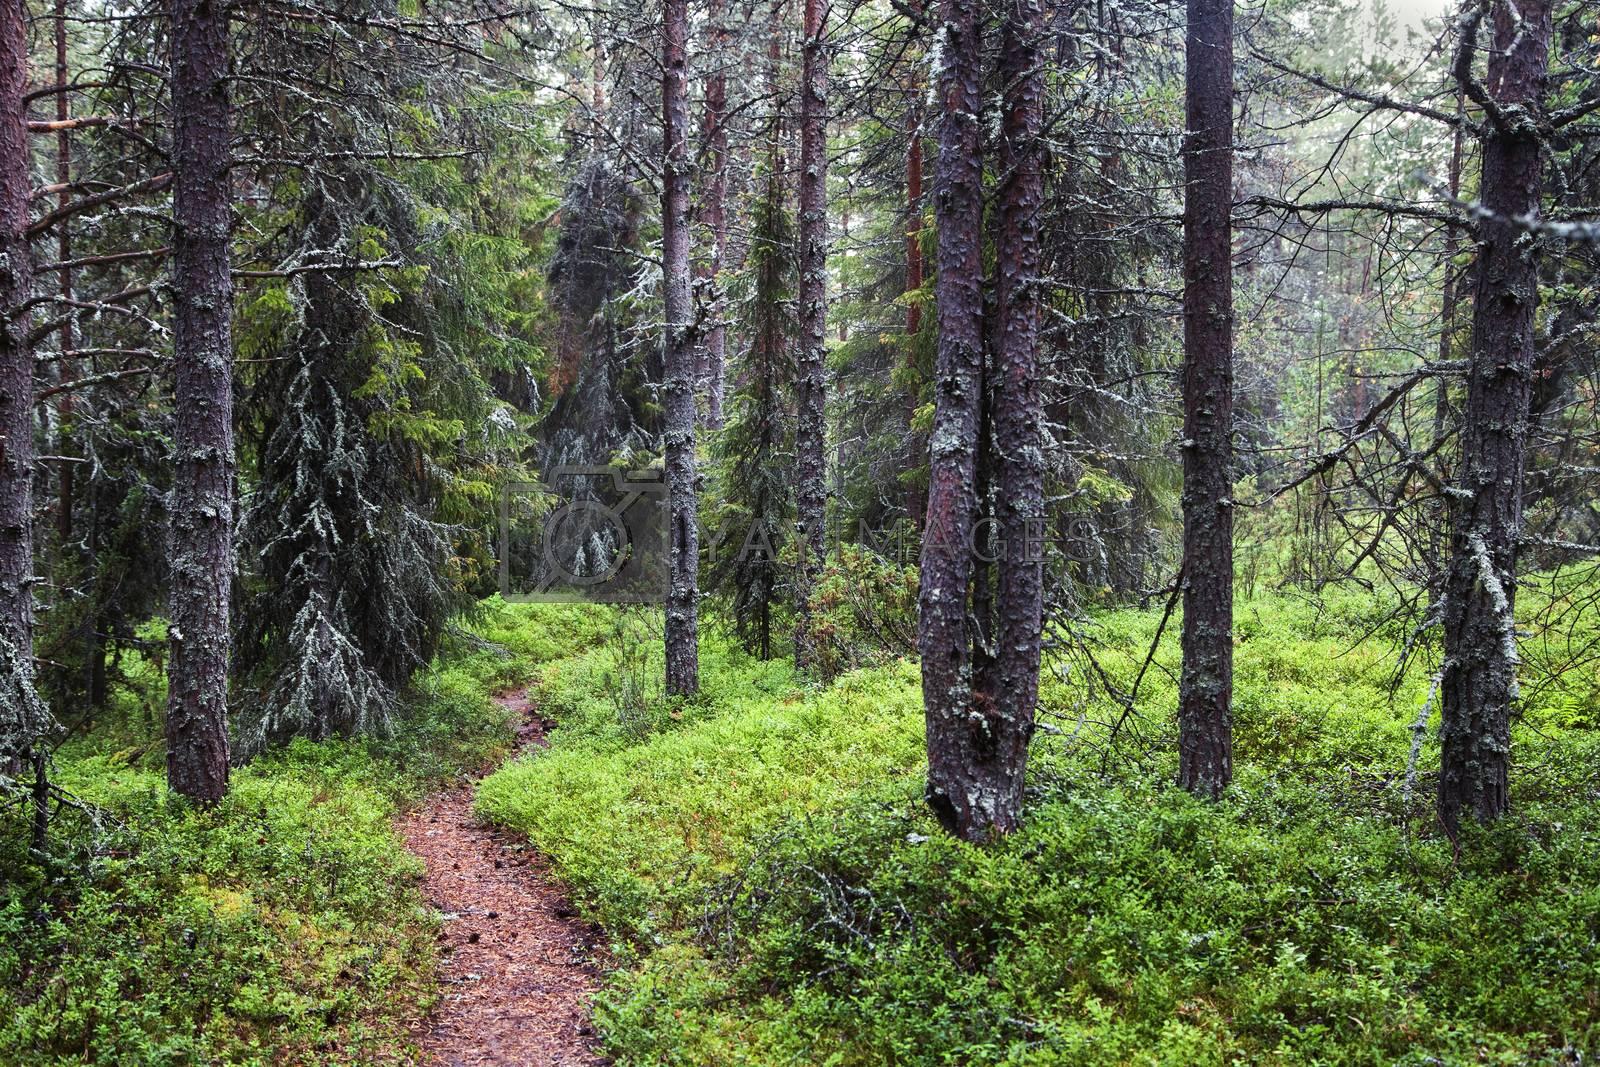 Royalty free image of Misty forest on Kola peninsula by Goodday